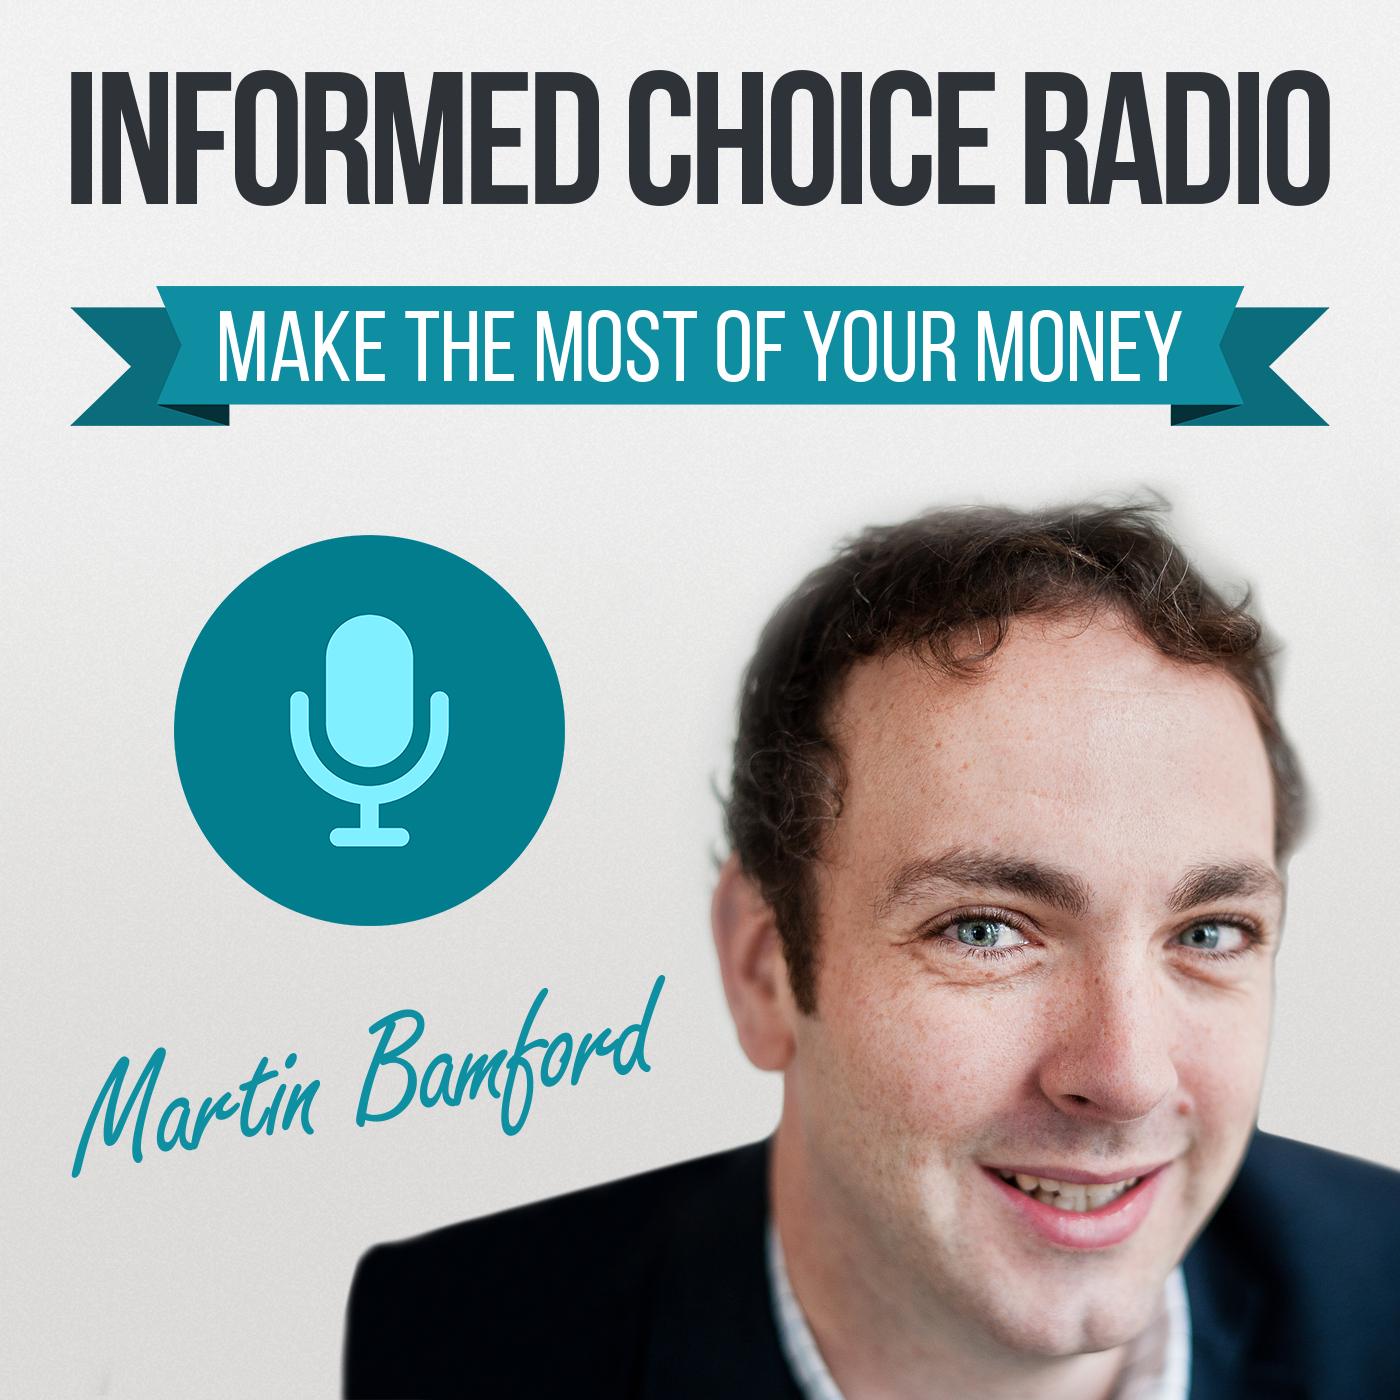 Informed Choice Radio - financial peace of mind with Martin Bamford